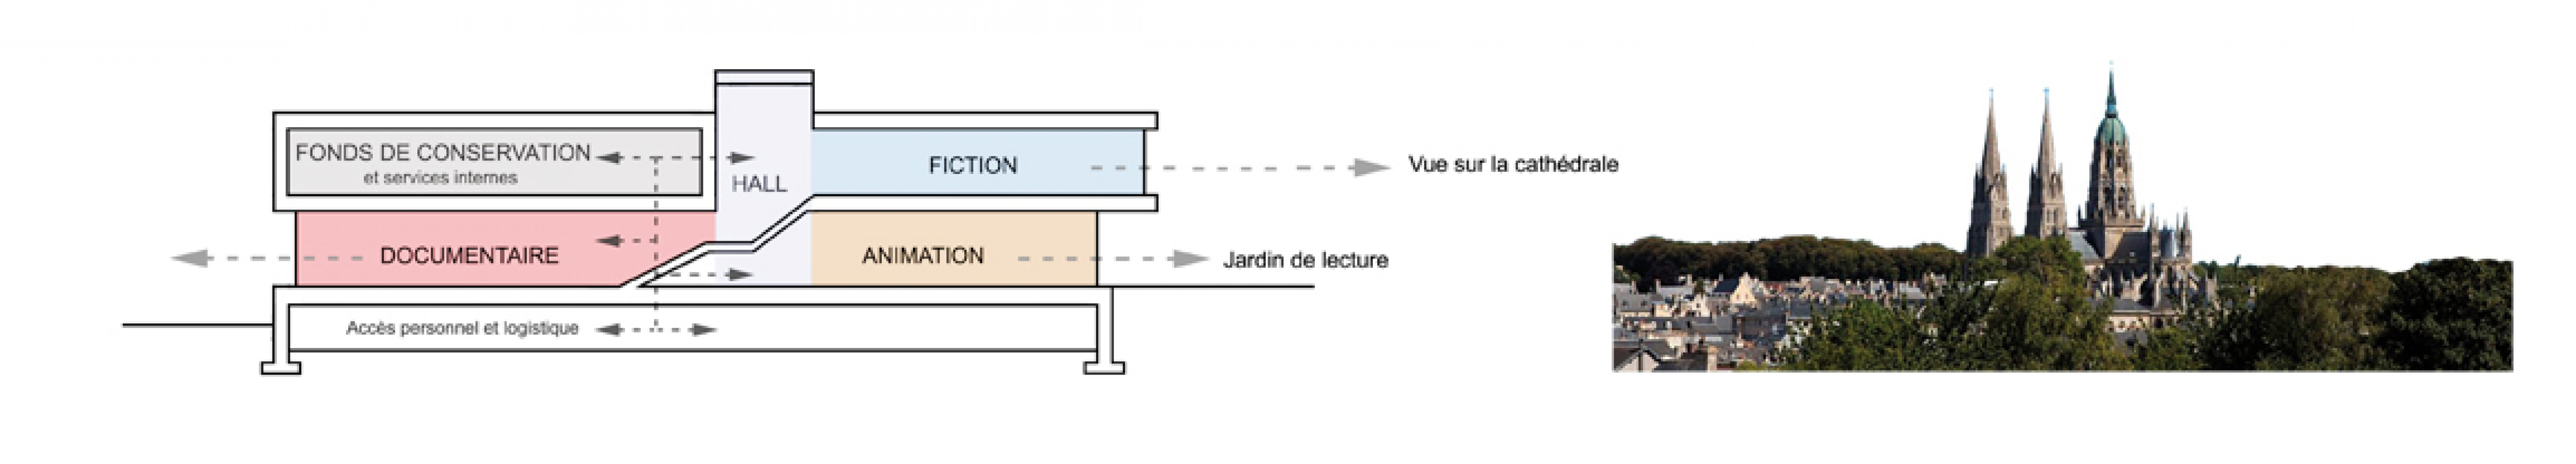 01-bayeux-img-003 Pascale SEURIN Architecte - Culturel